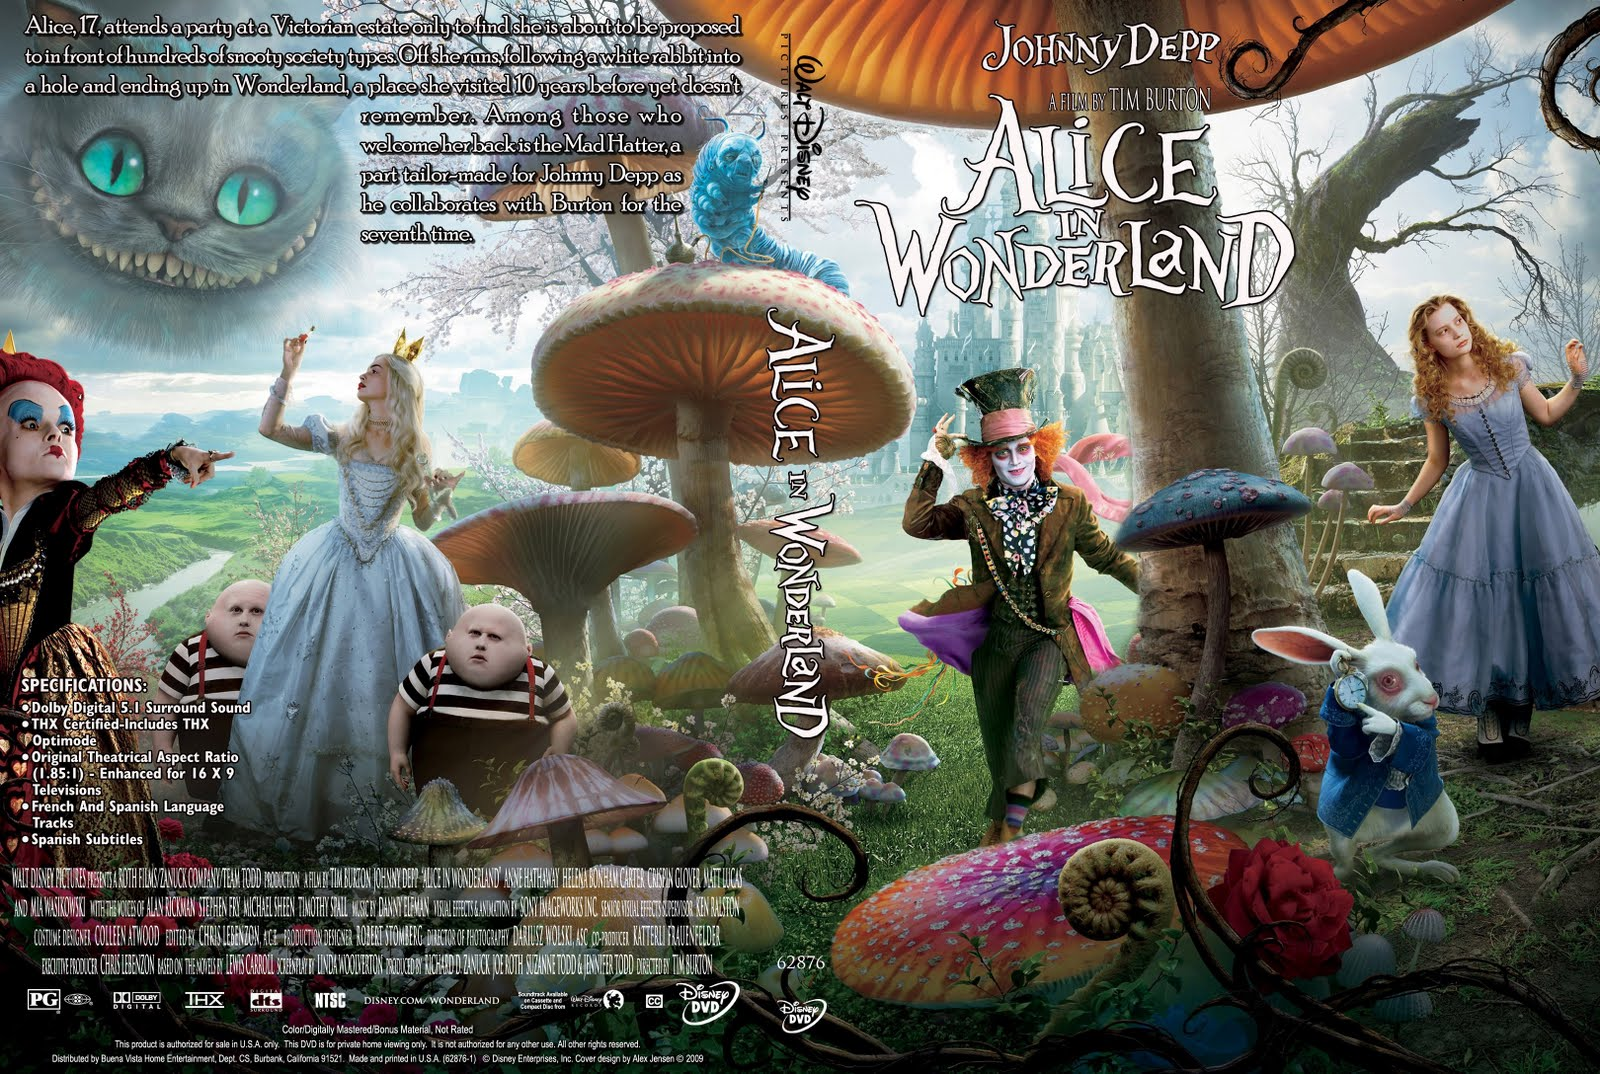 http://1.bp.blogspot.com/_Lh0381Jyu64/TAUHVU34NAI/AAAAAAAAAhw/871_ZfdWxXo/s1600/Alice_In_Wonderland_2010.jpg